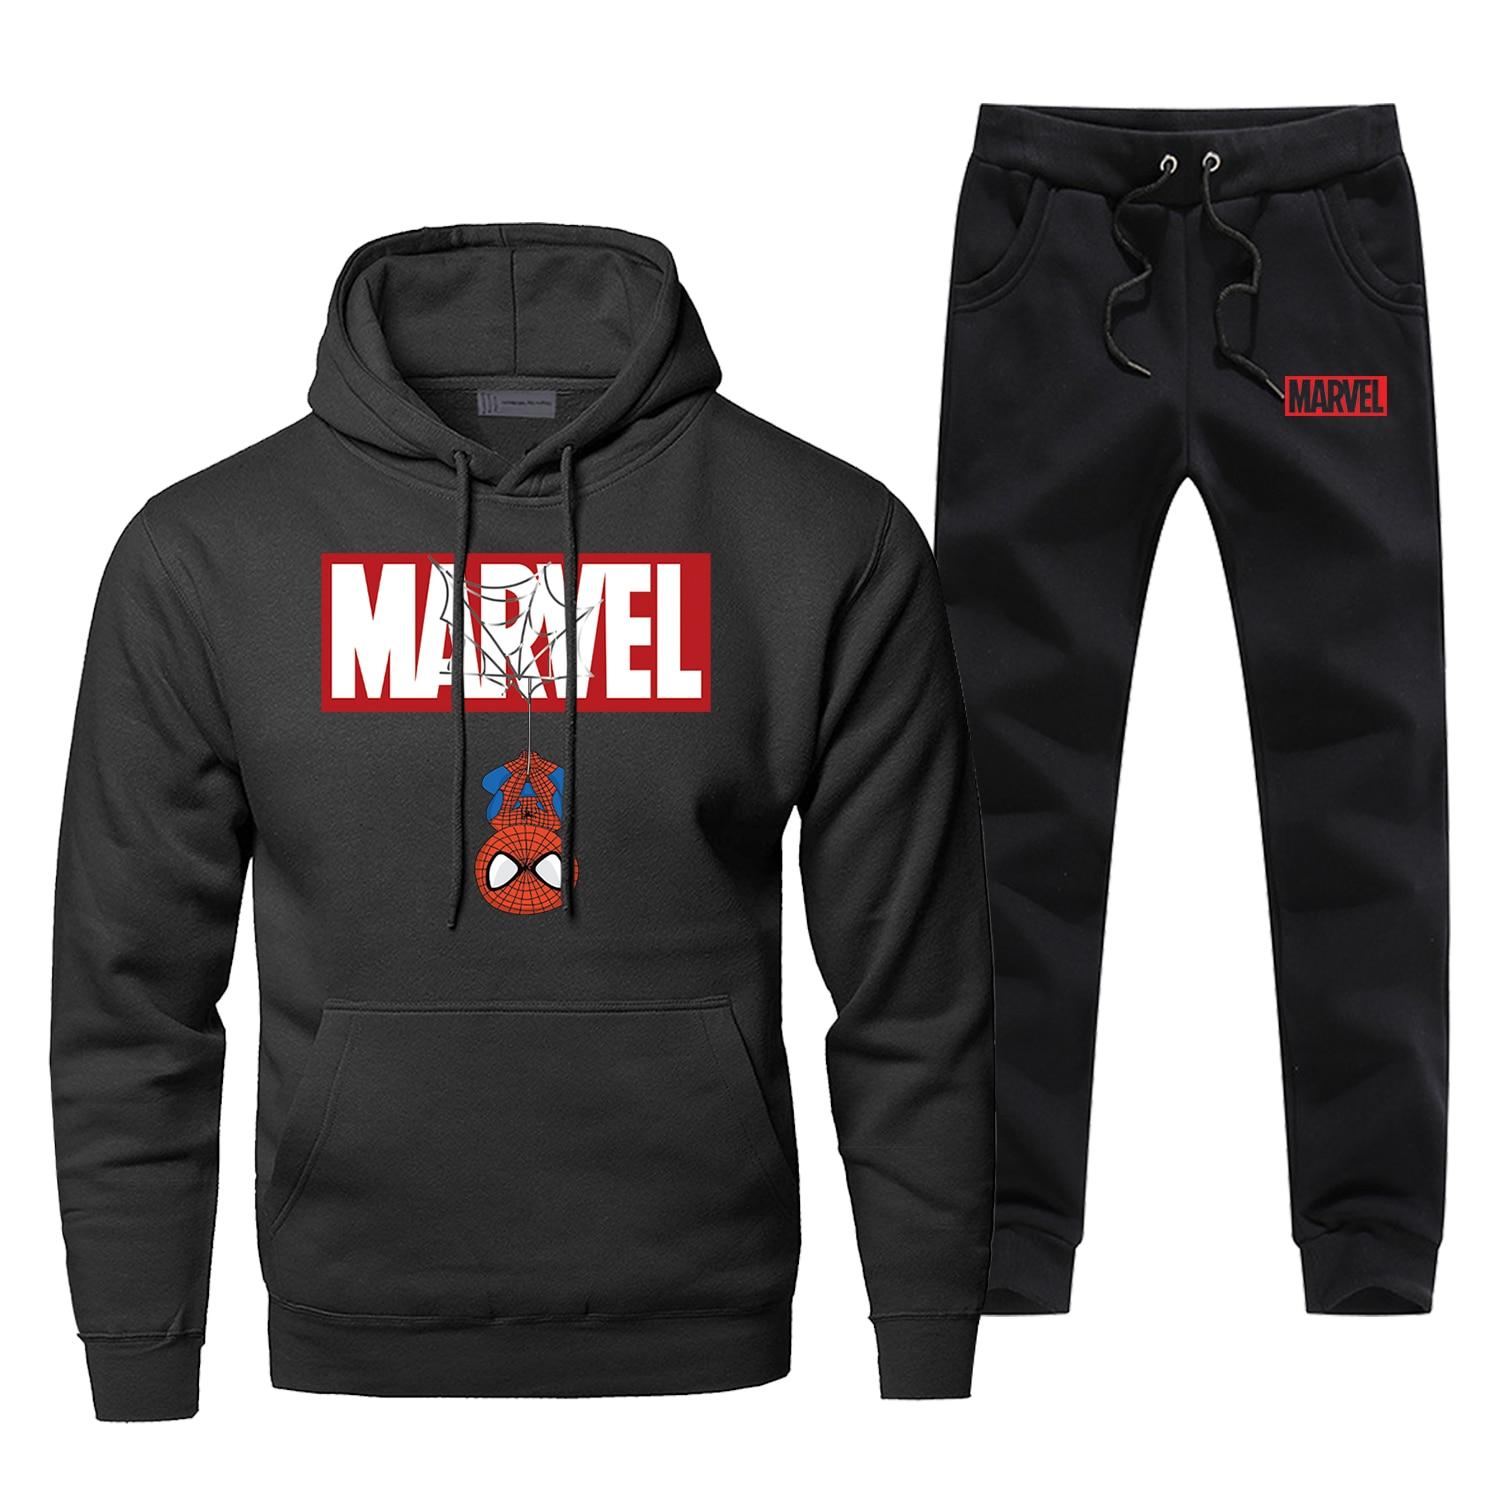 Spider-Man Super Hero 2 Piece Set 2019 Fashion Winter Streetwear Hoodies Sweatpants Fashion Fleece Casual Complete Man Tracksuit